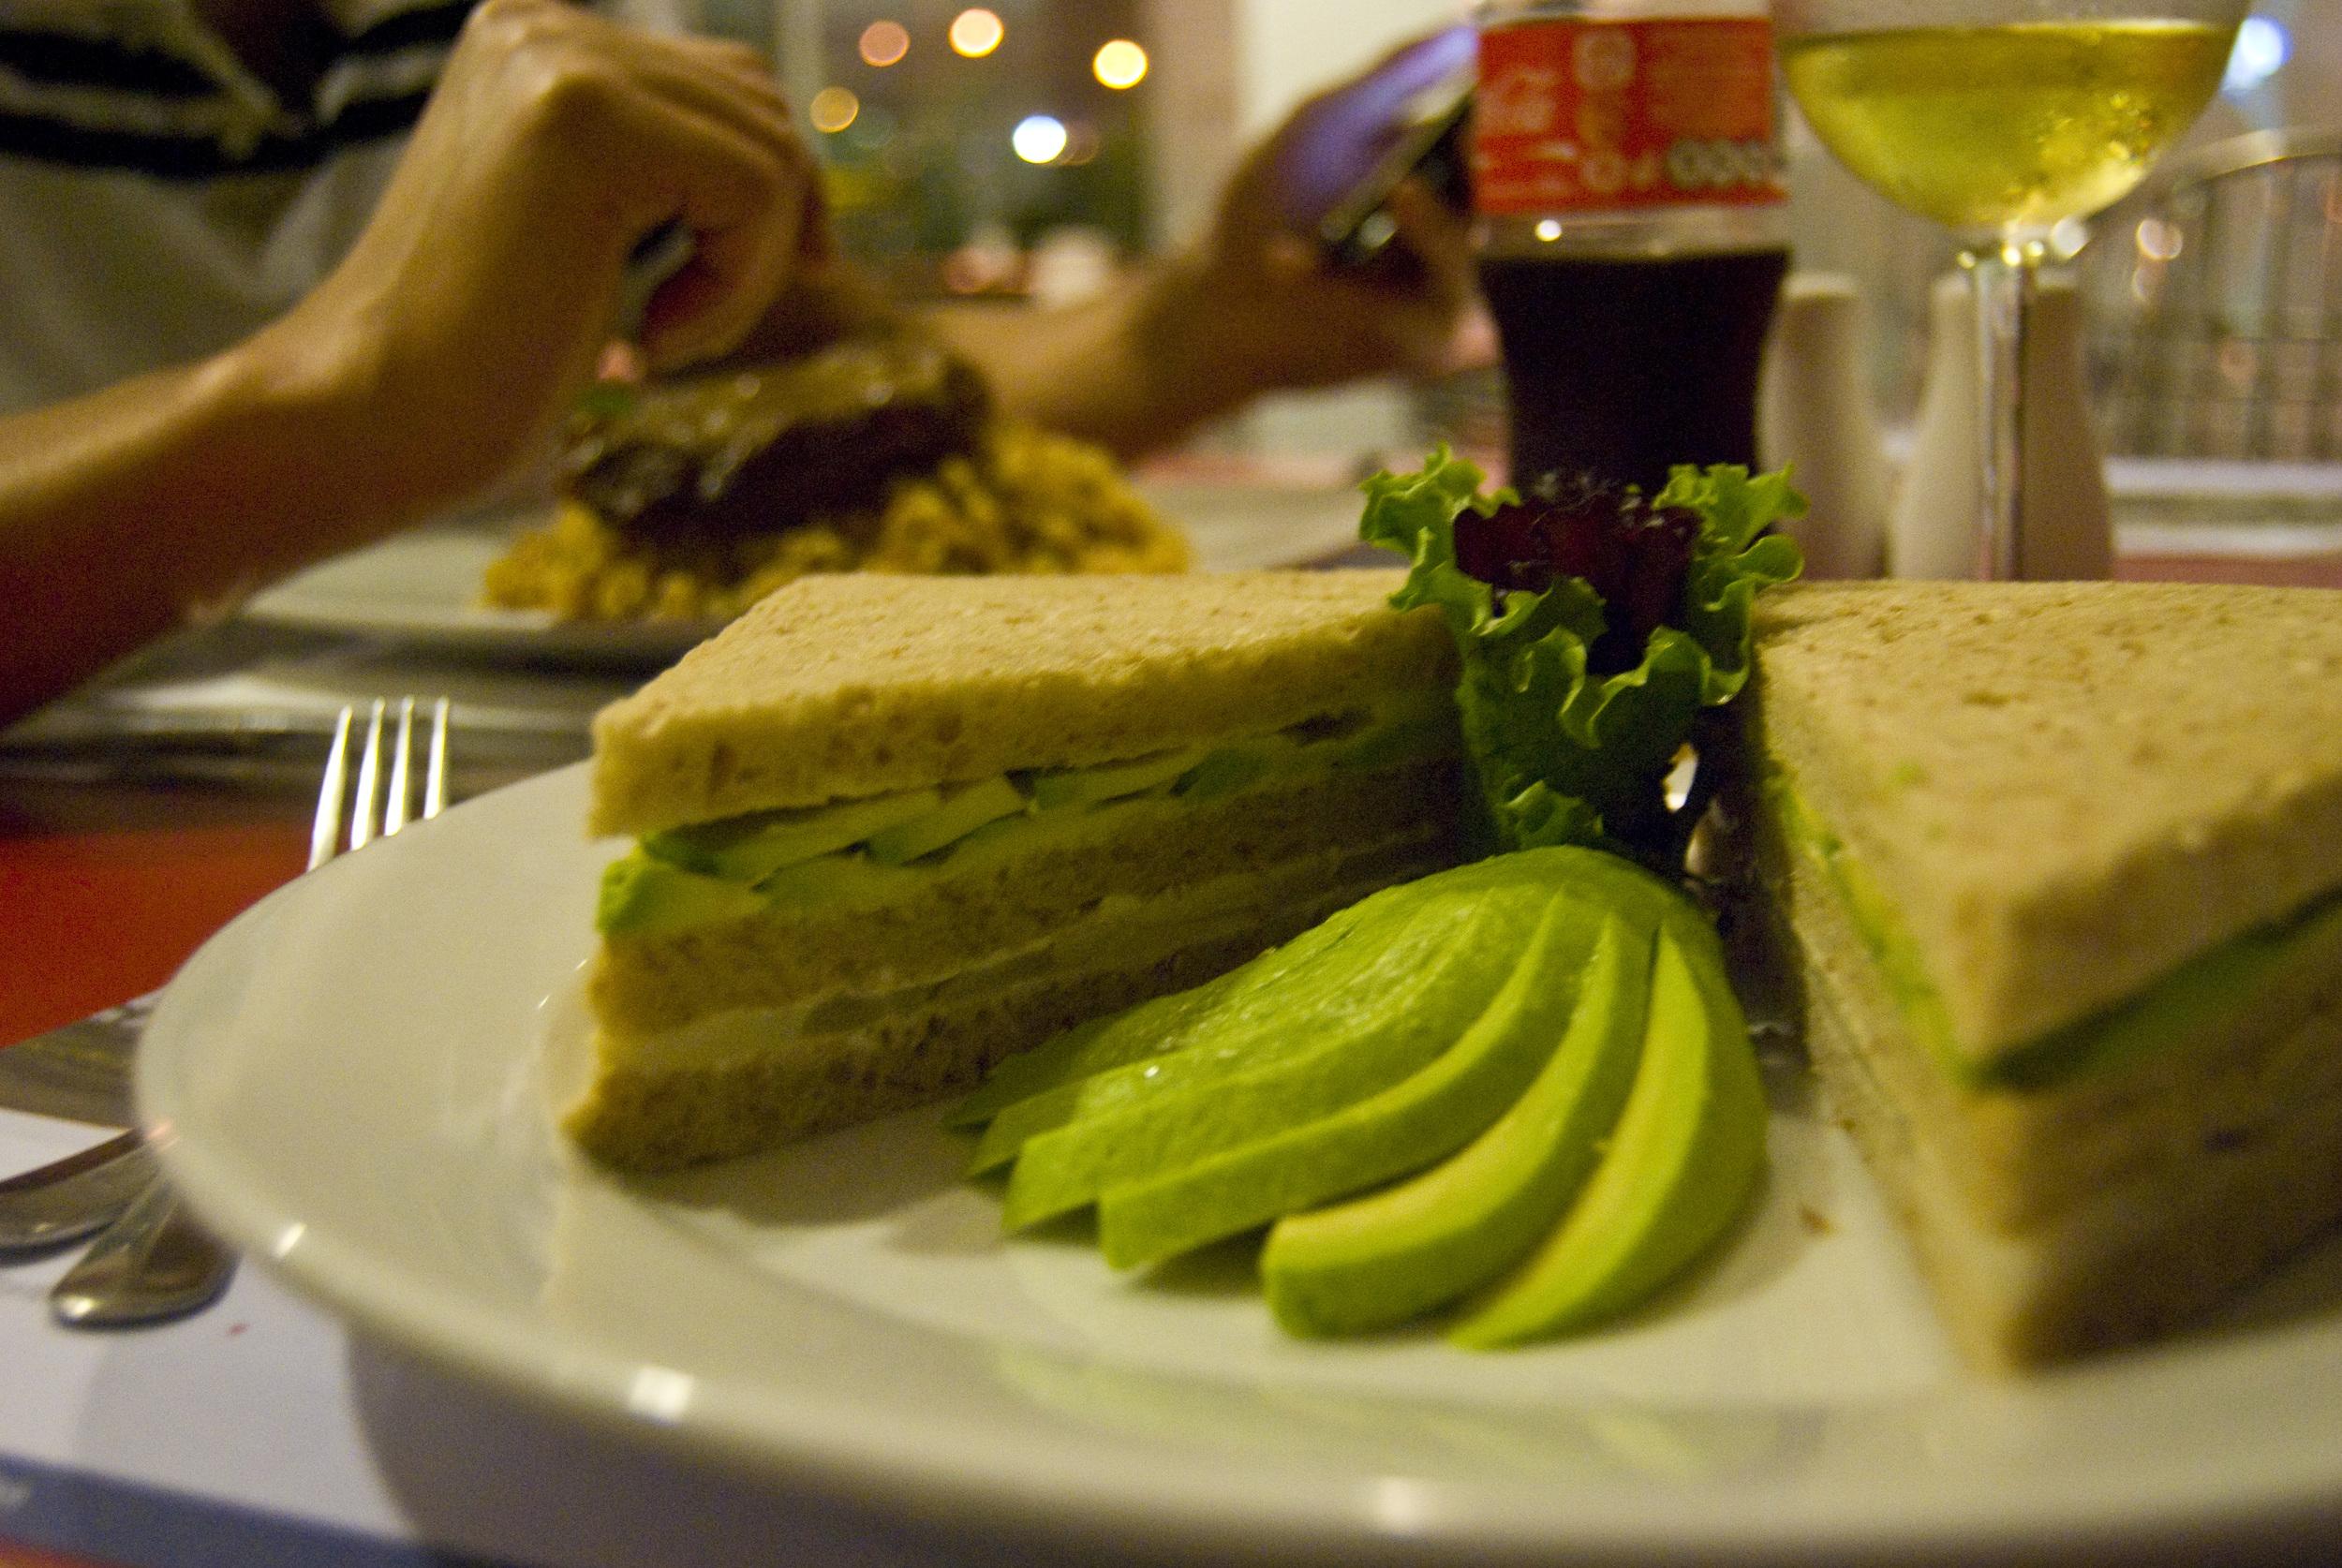 veg-sandwich_4121961359_o.jpg